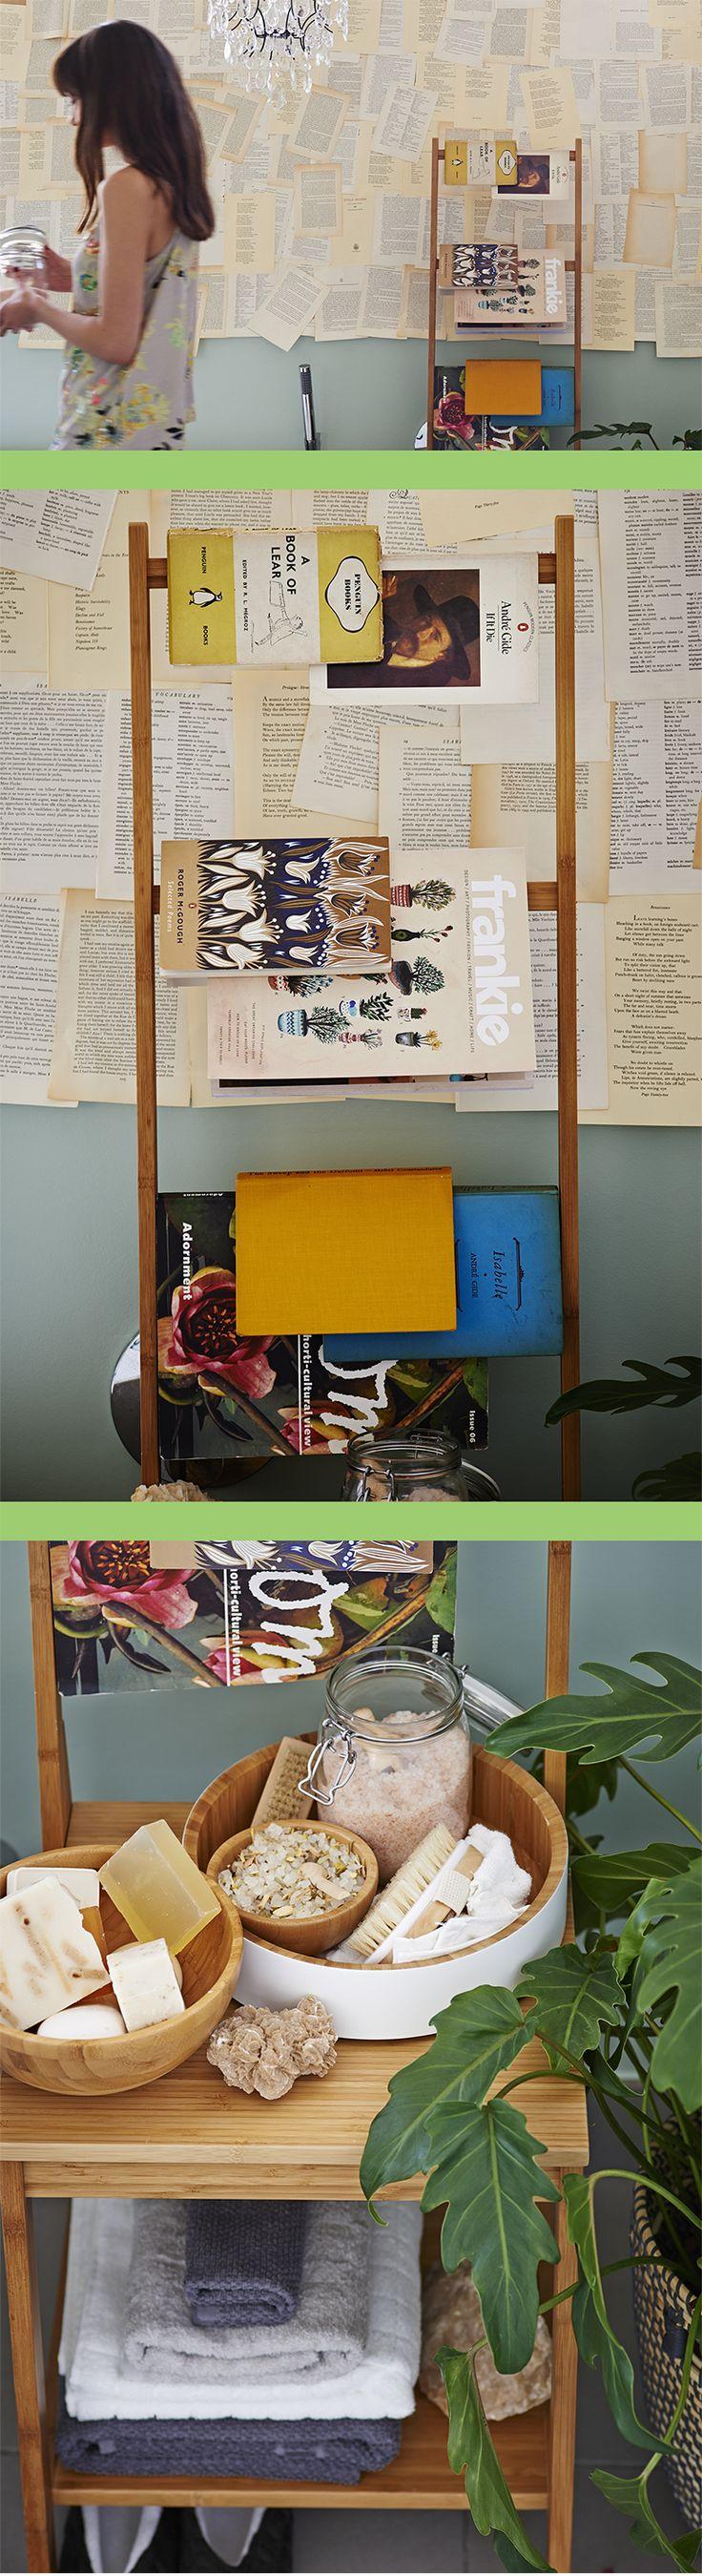 1000 idées sur le thème badezimmer novel sur pinterest | novel, Badezimmer